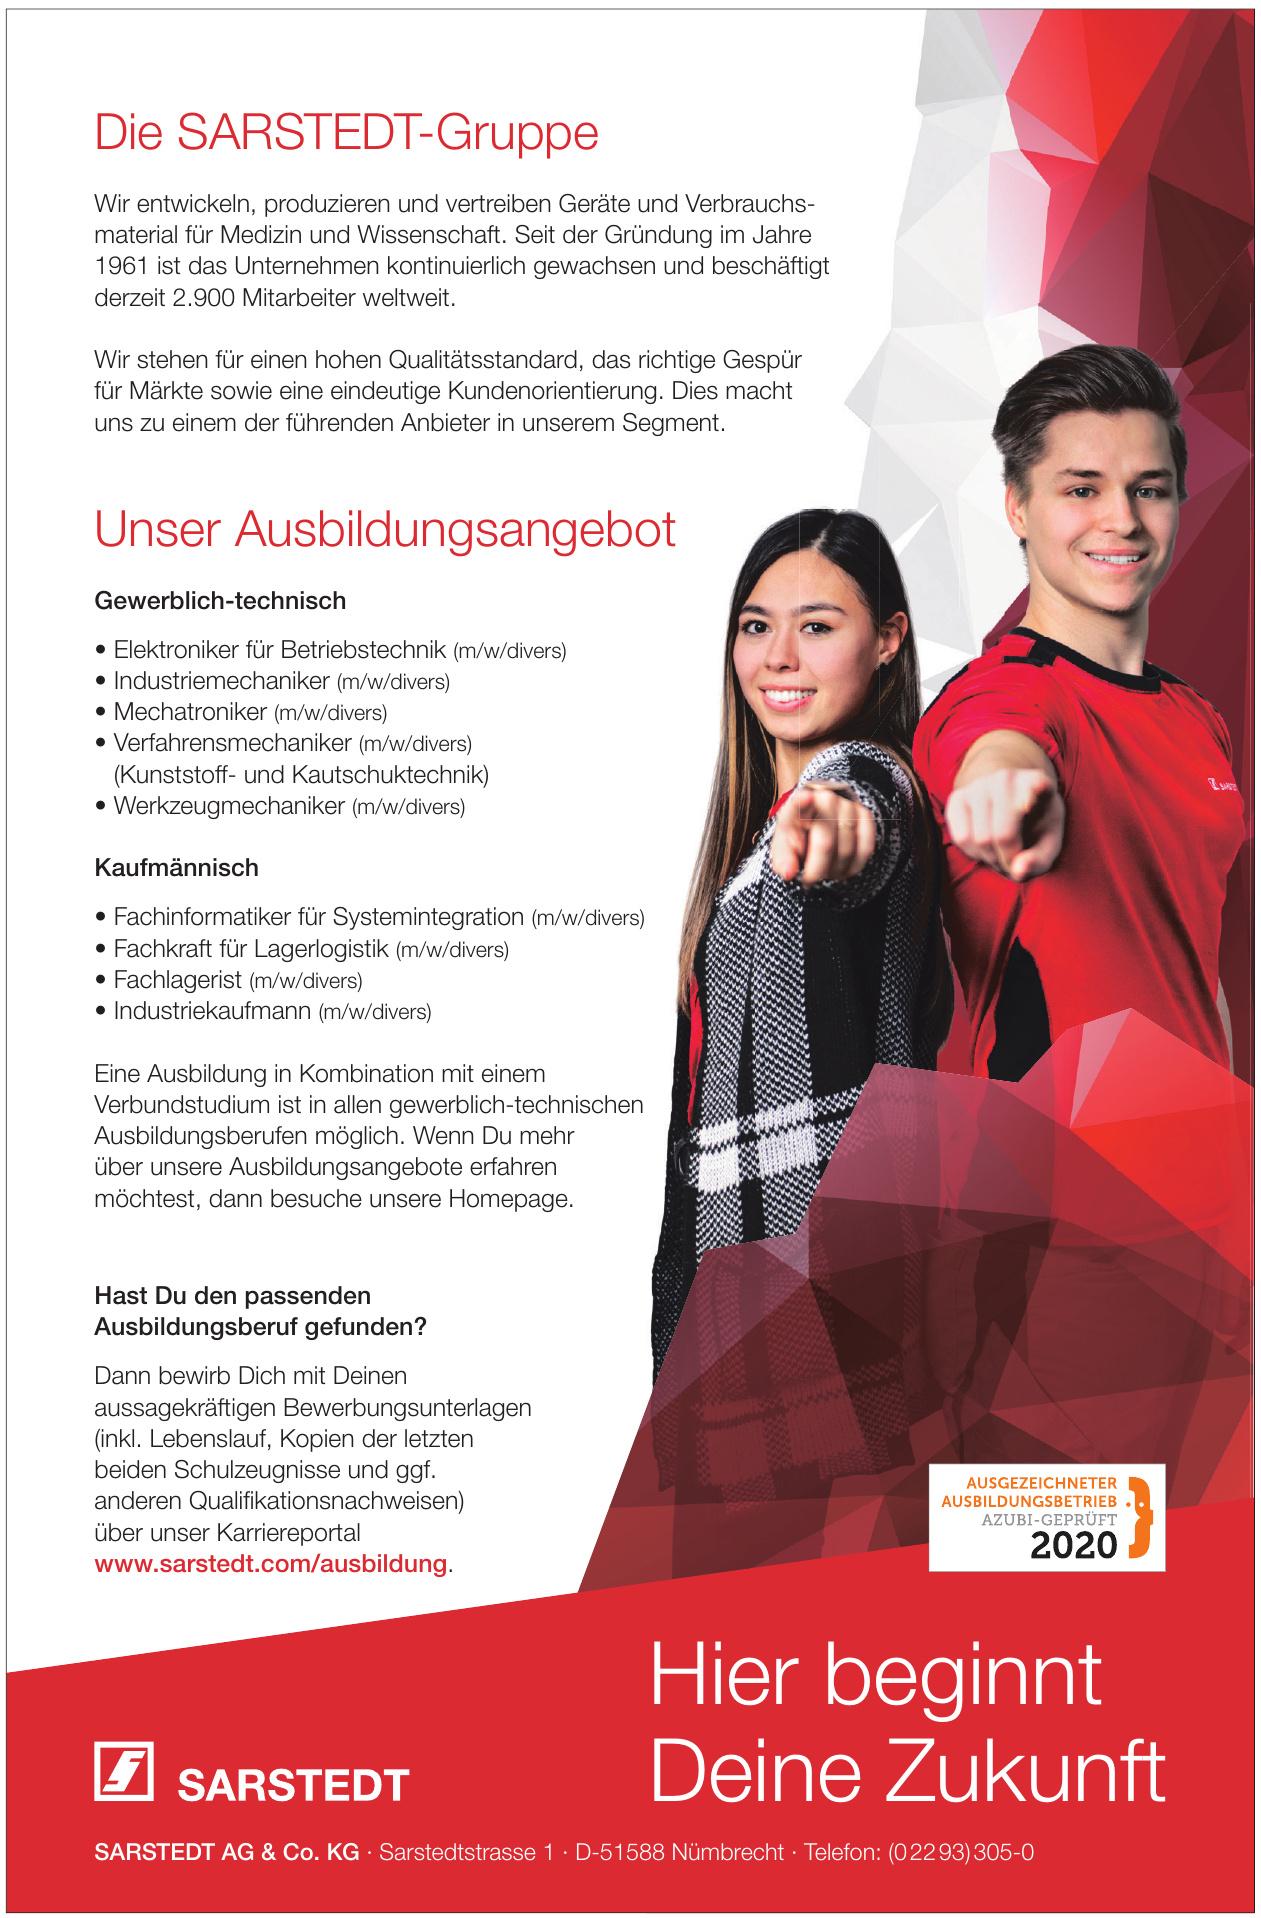 Sarstedt AG & Co. KG